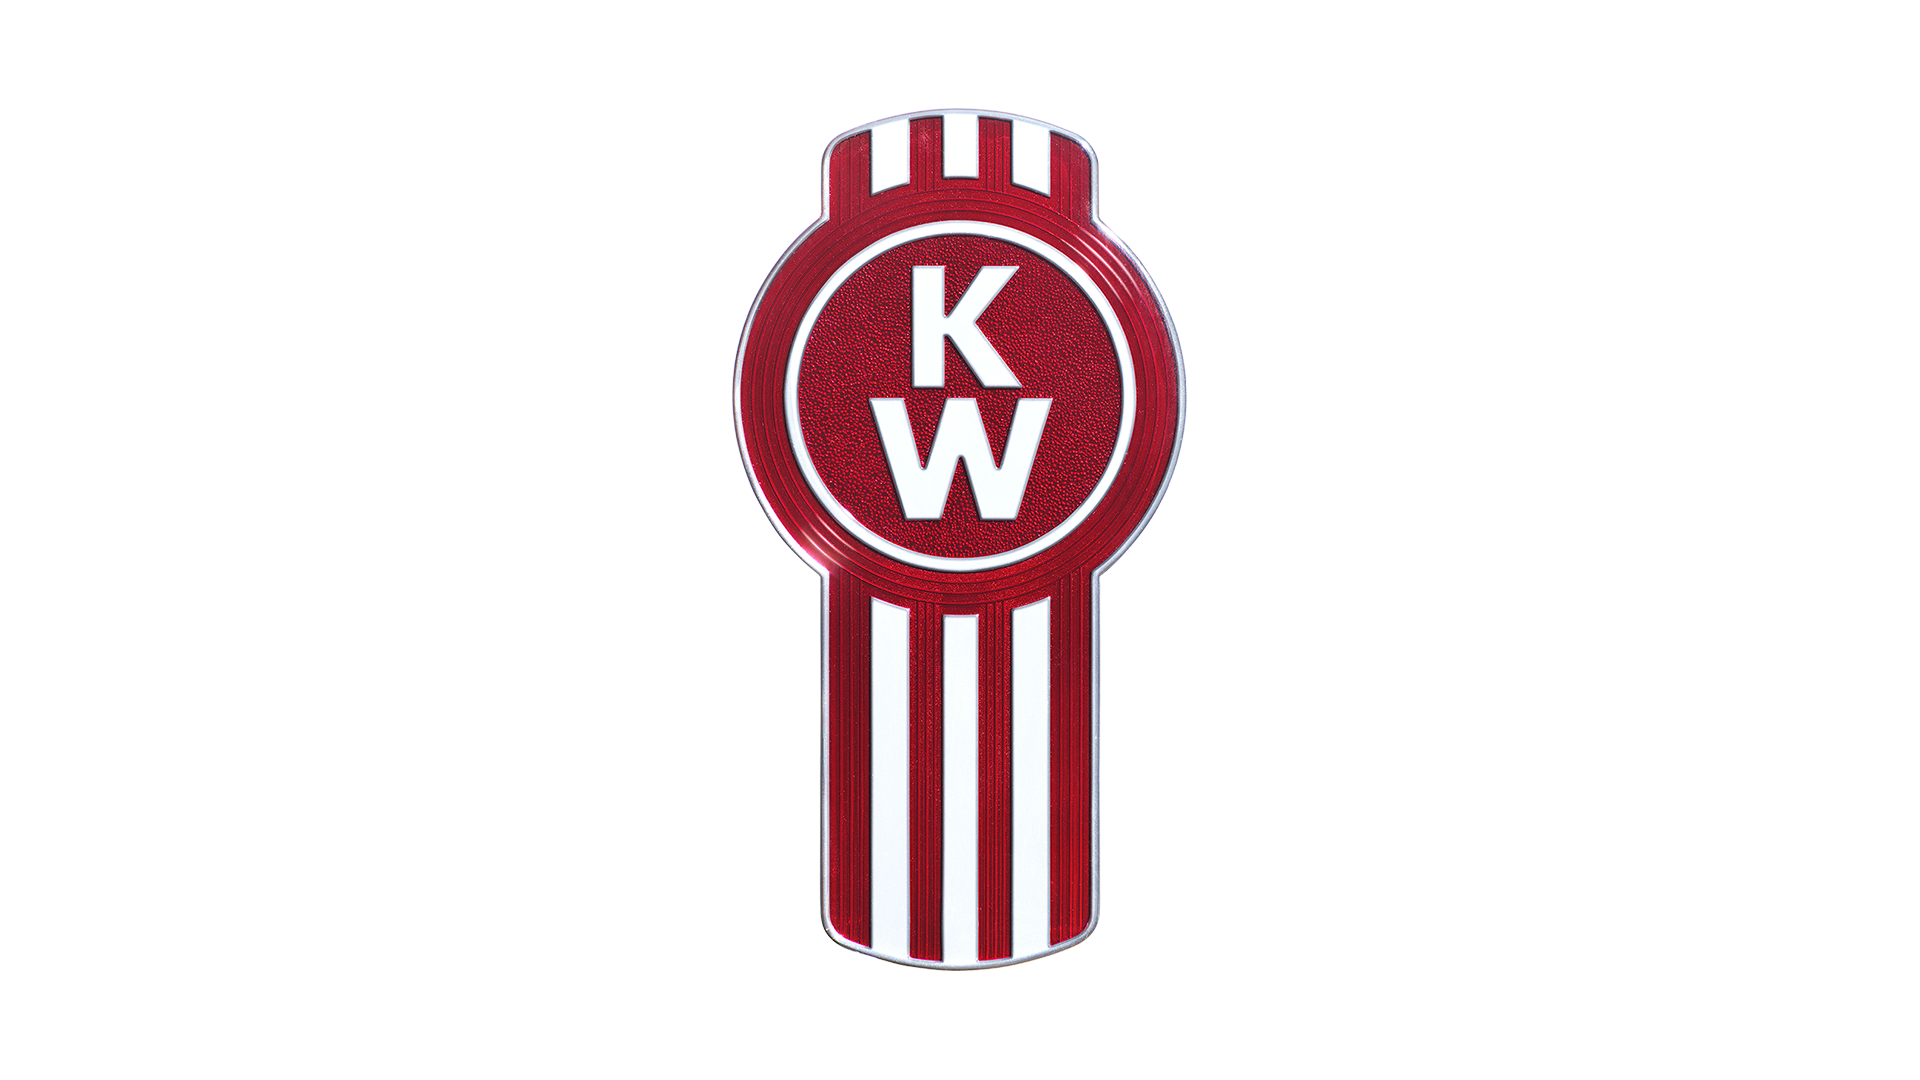 Kenworth Service Repair Manuals Pdf Free Download Pdf Ewd Manuals